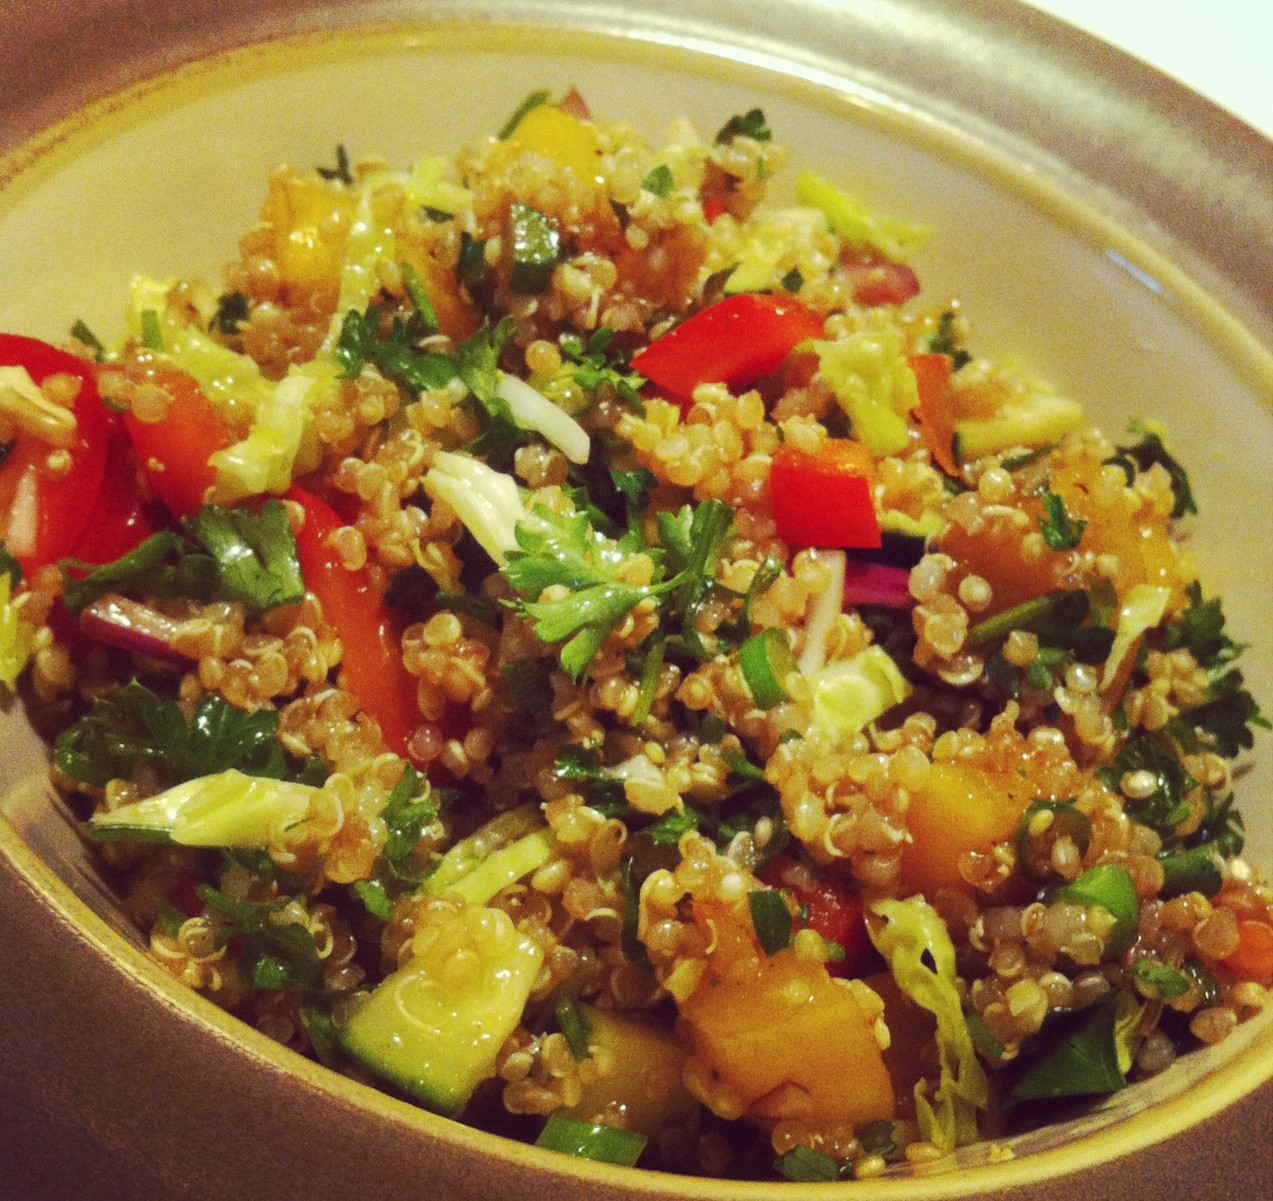 Quinoa Recipe Healthy  Quinoa Salad Healthy Recipes Clear Path Chiropractic